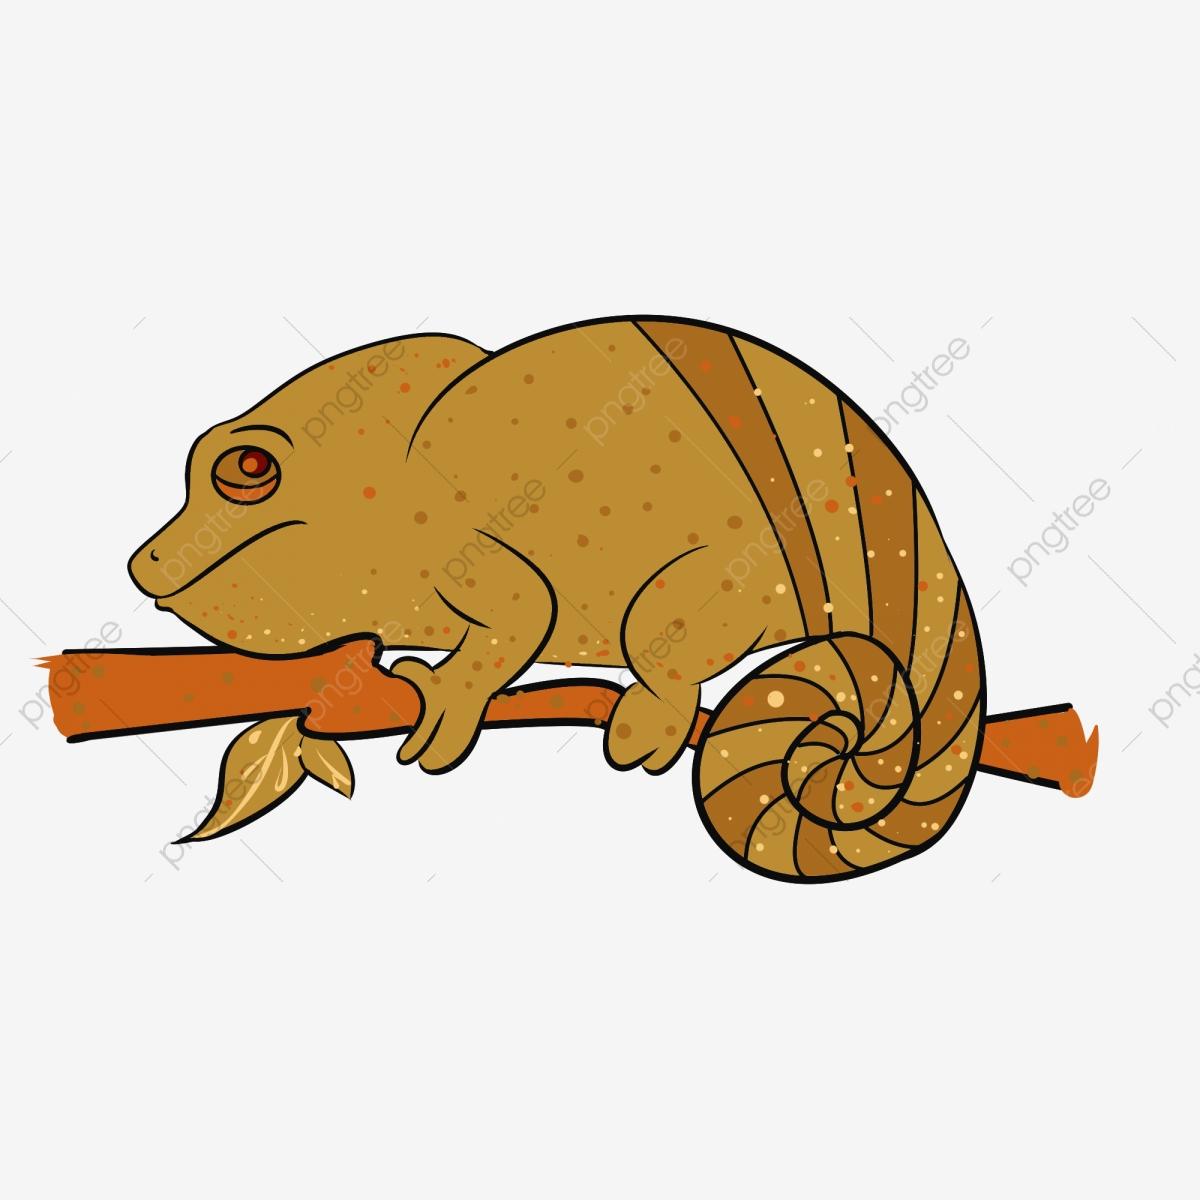 Yellow lizard cute cartoon. Chameleon clipart adorable